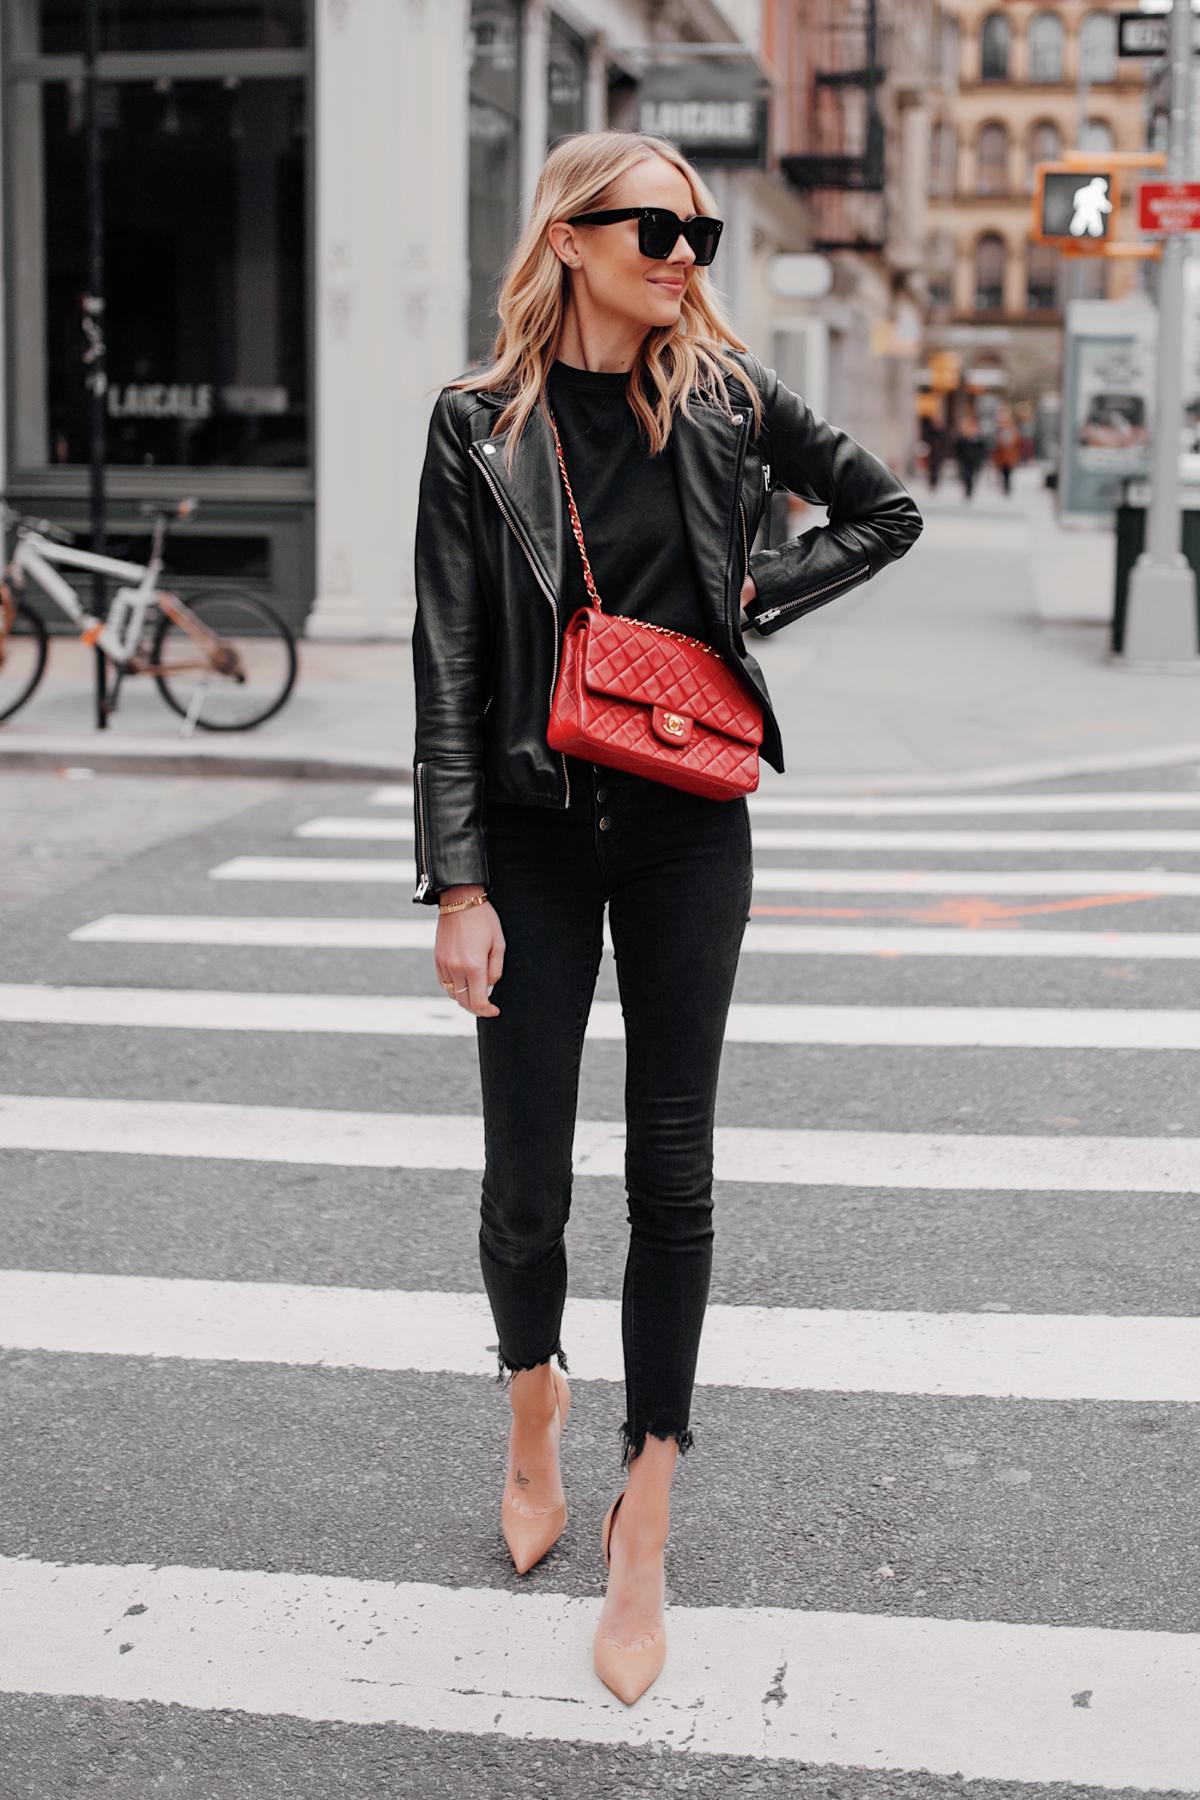 Fashion Jackson Wearing Black Leather Jacket Black Skinny Jeans Red Chanel Handbag Nude Pumps NYC Street Style 1